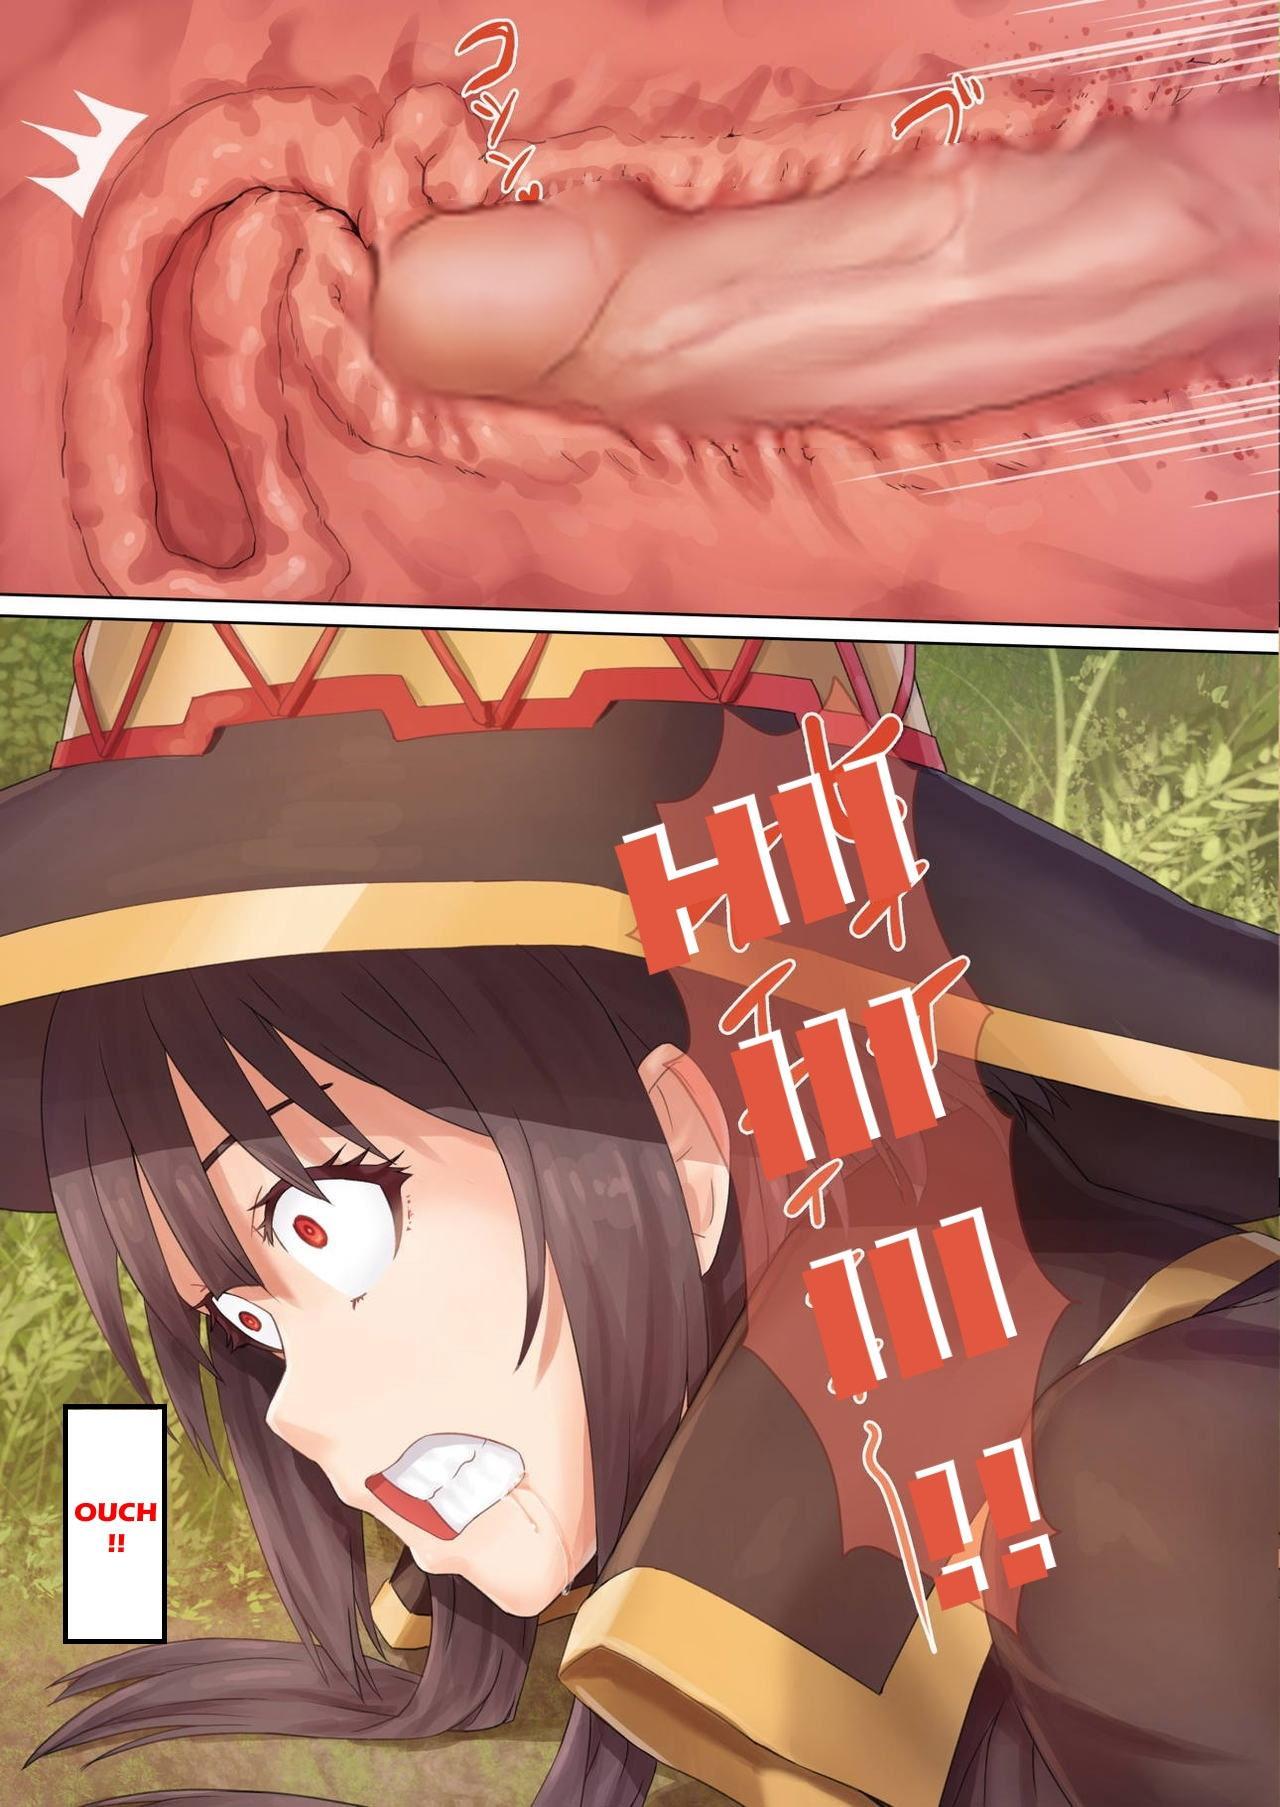 Kono Subarashii Mahoutsukai ni Maryoku Hokyuu o! | My Magical Supplement upon this Wonderful Wizard! 8